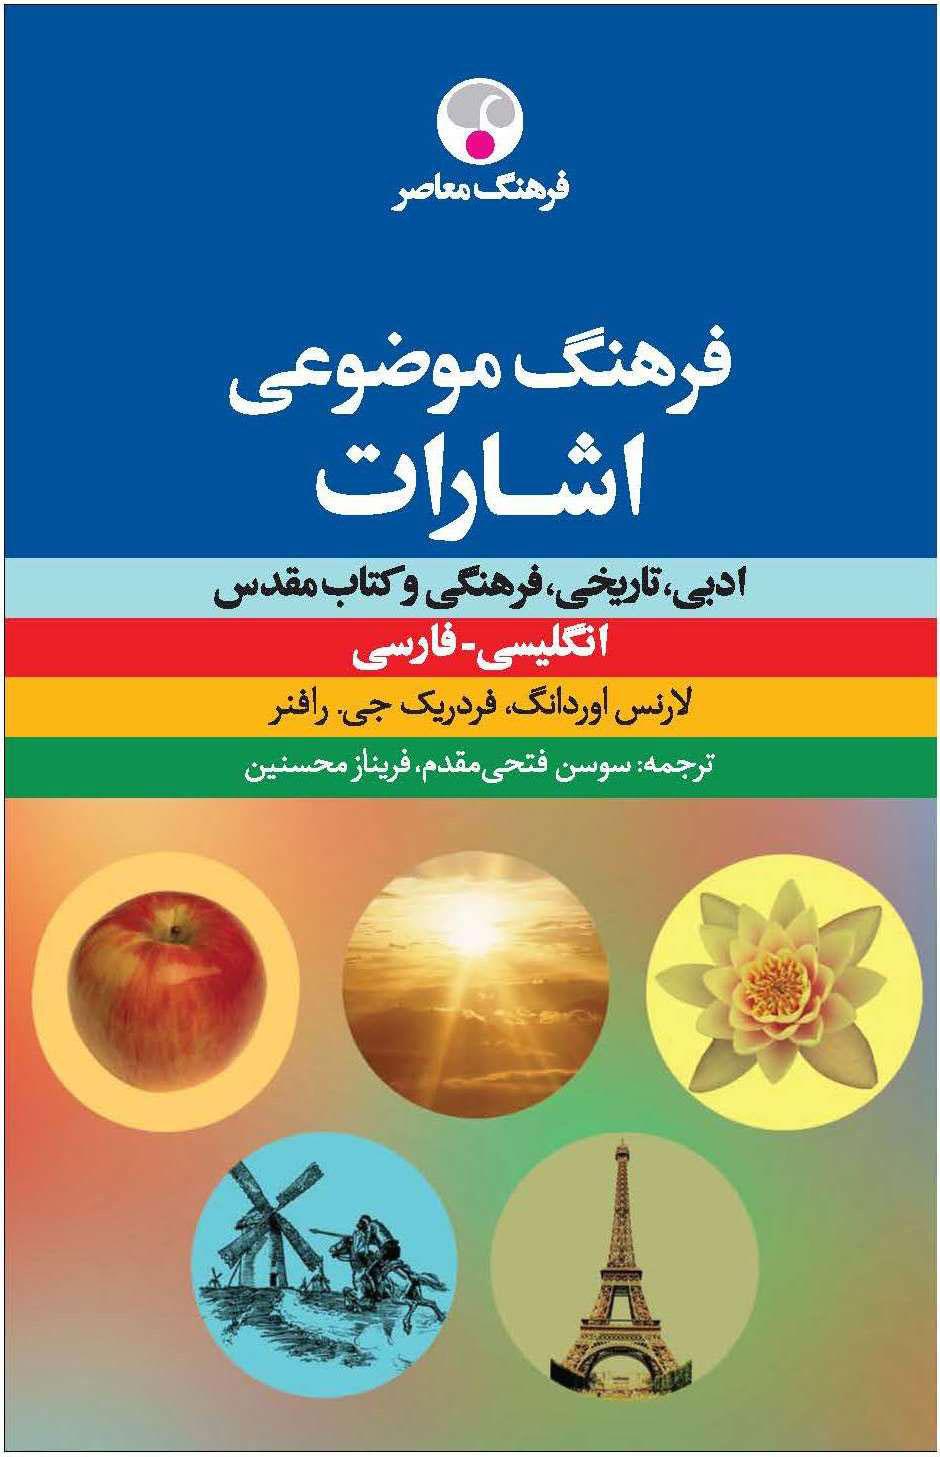 کتاب فرهنگ موضوعی اشارات : انگلیسی فارسی